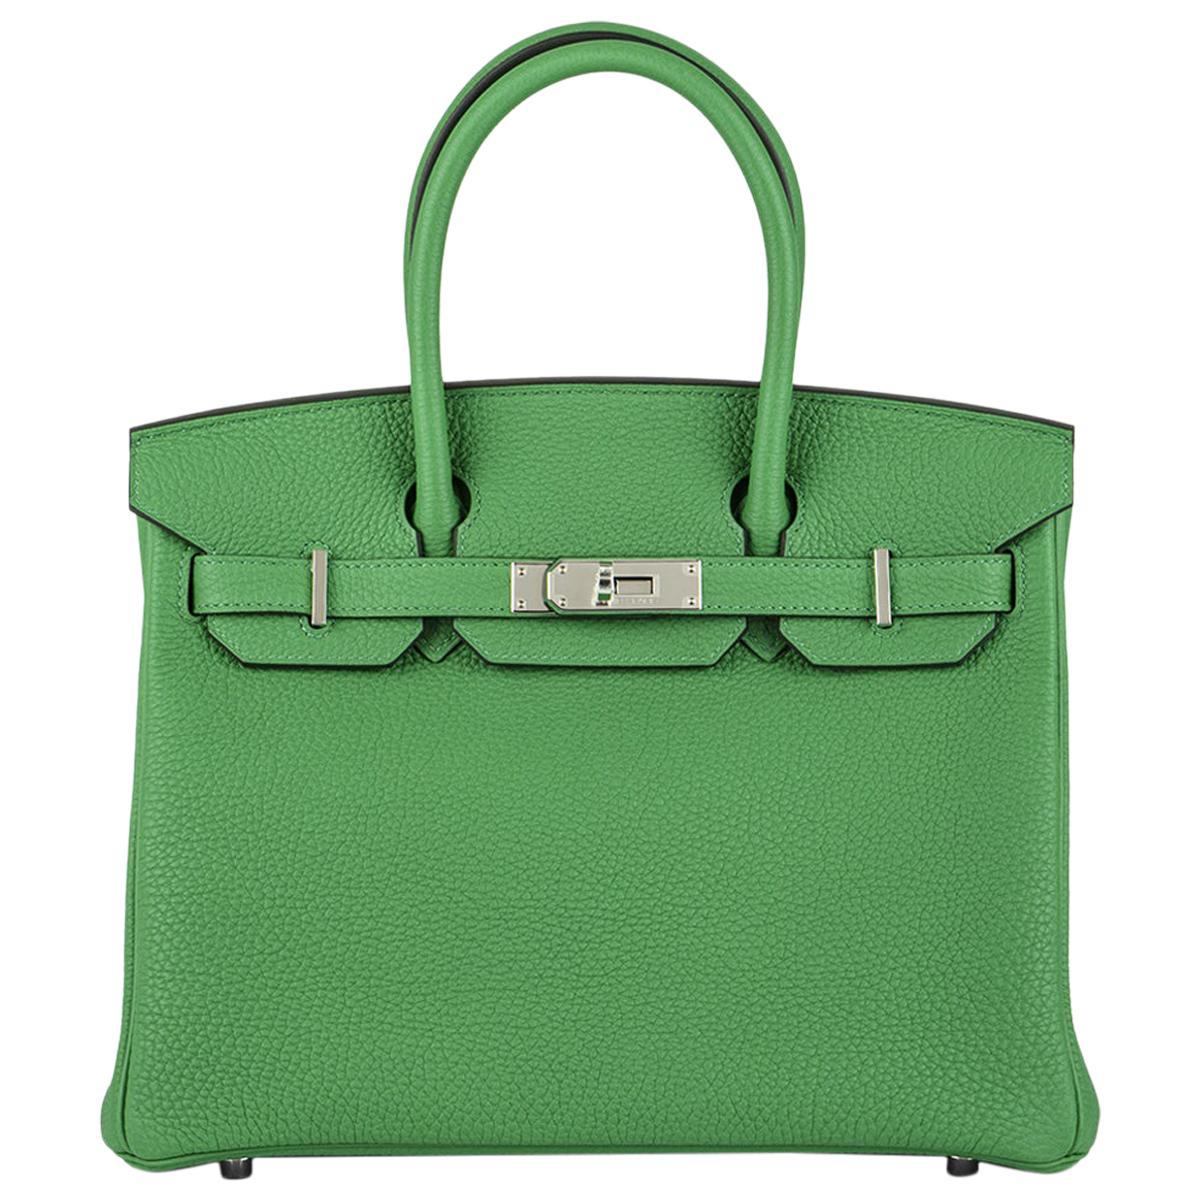 Hermès Birkin 30 Bambou/ Caramel Verso Togo PHW